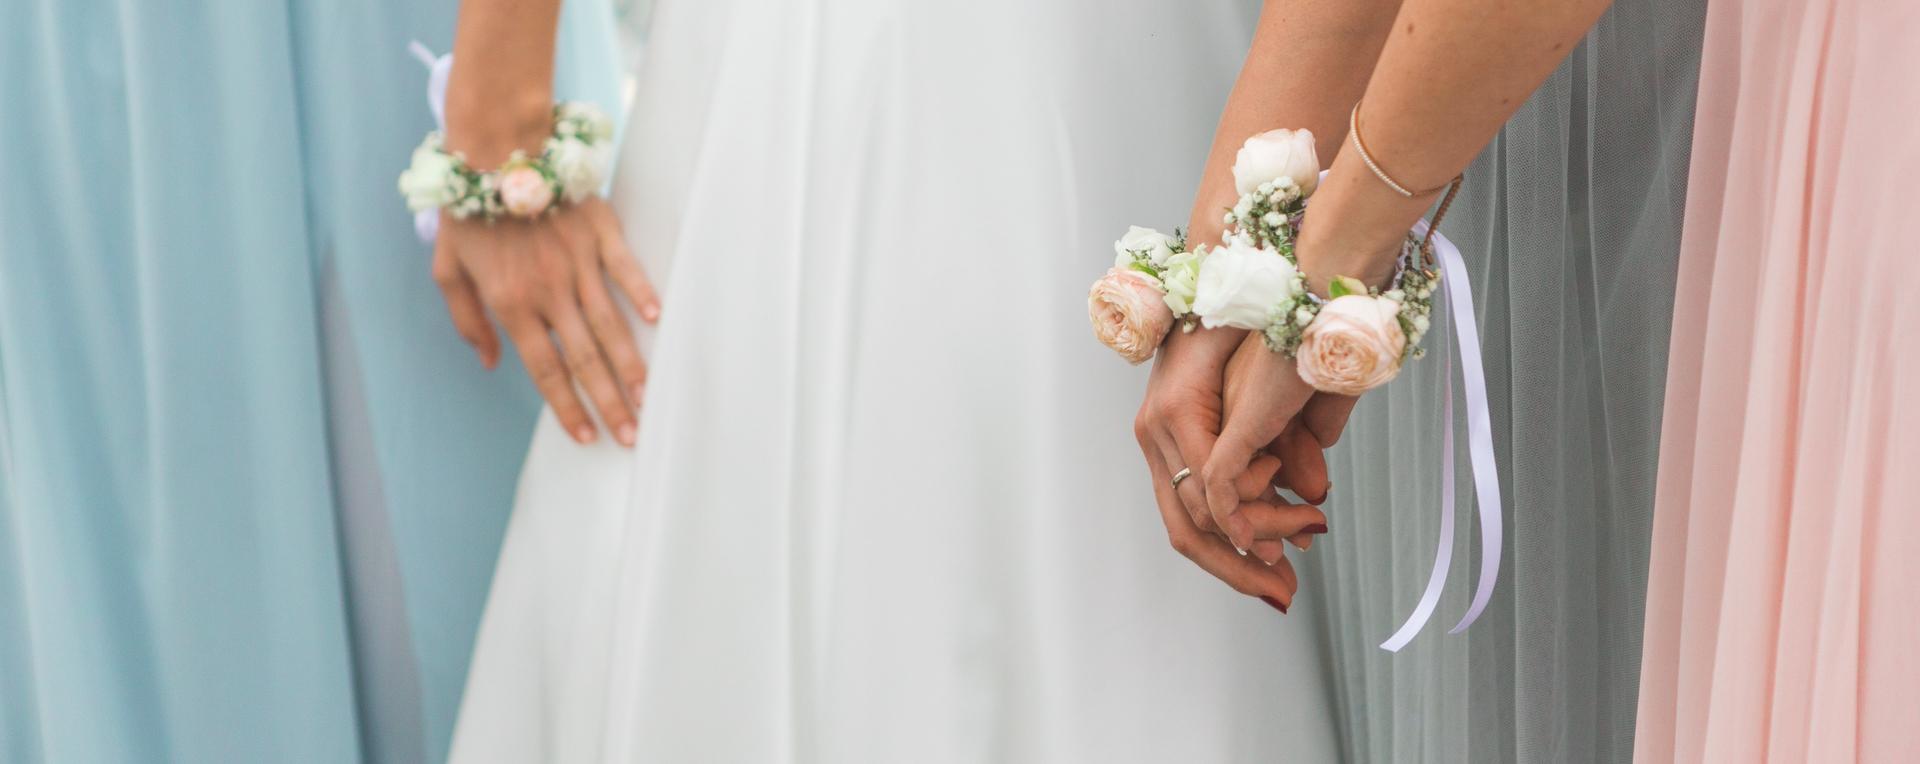 Wedding-Dresses-4326